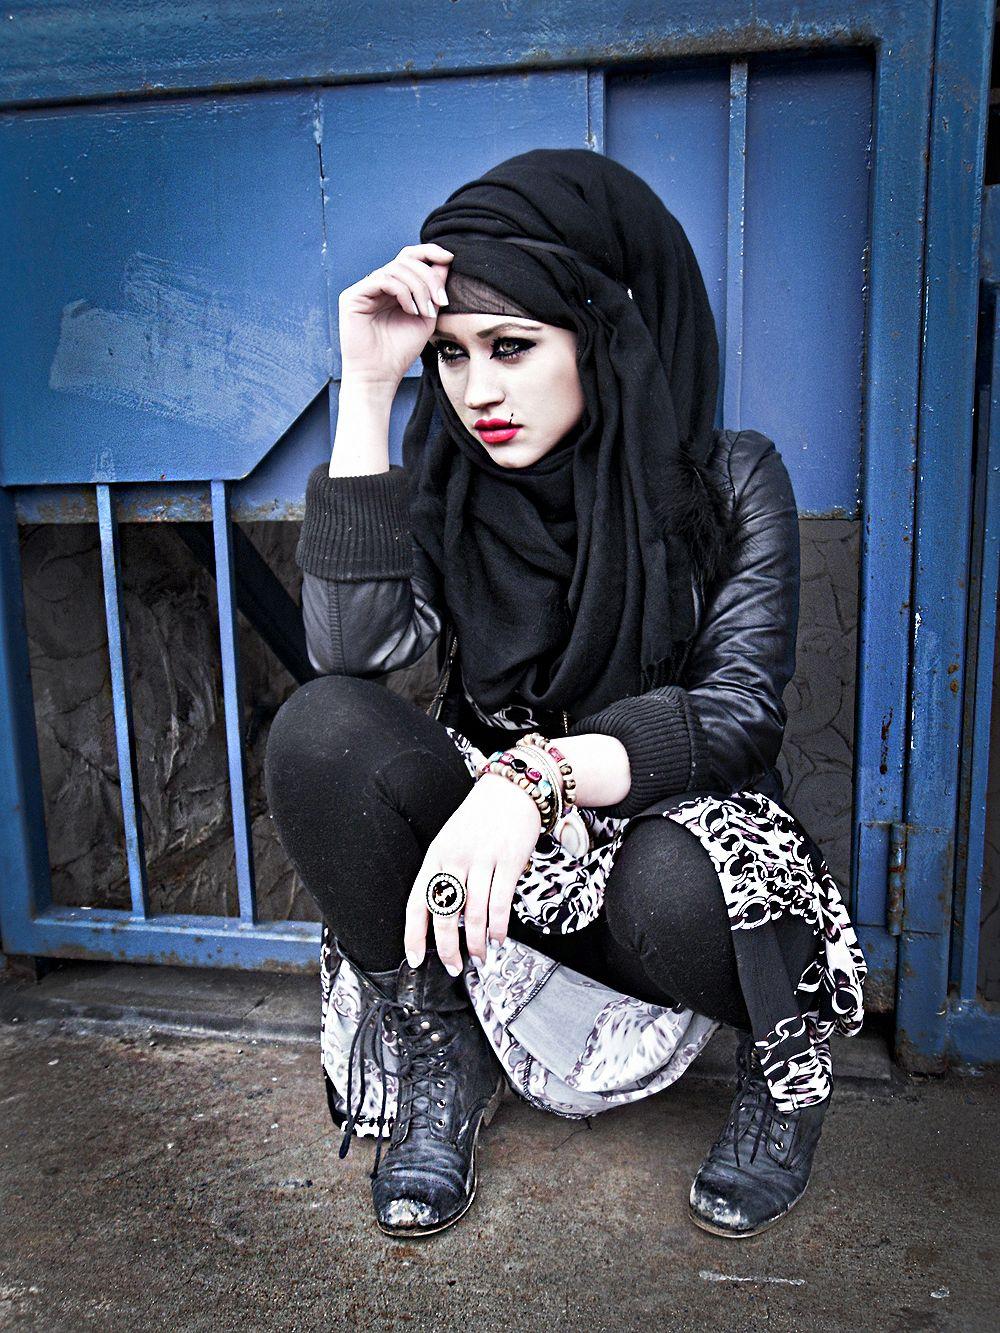 Darque Lovely No One Knows Im Here Gothic Fashion Pinterest Tendencies Kaos Faith Hitam M